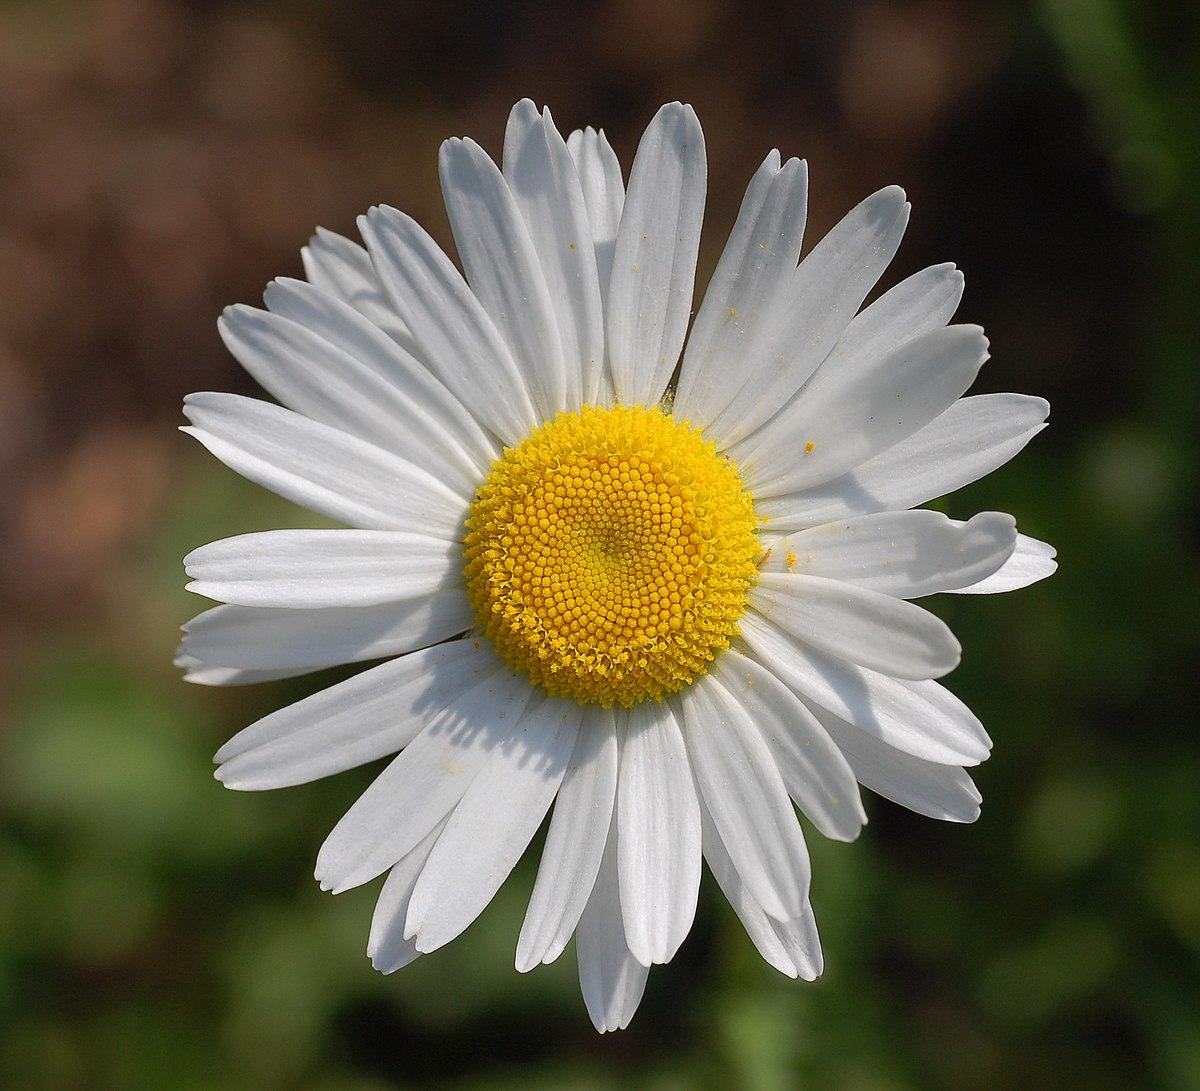 Dating daisy darsteller english